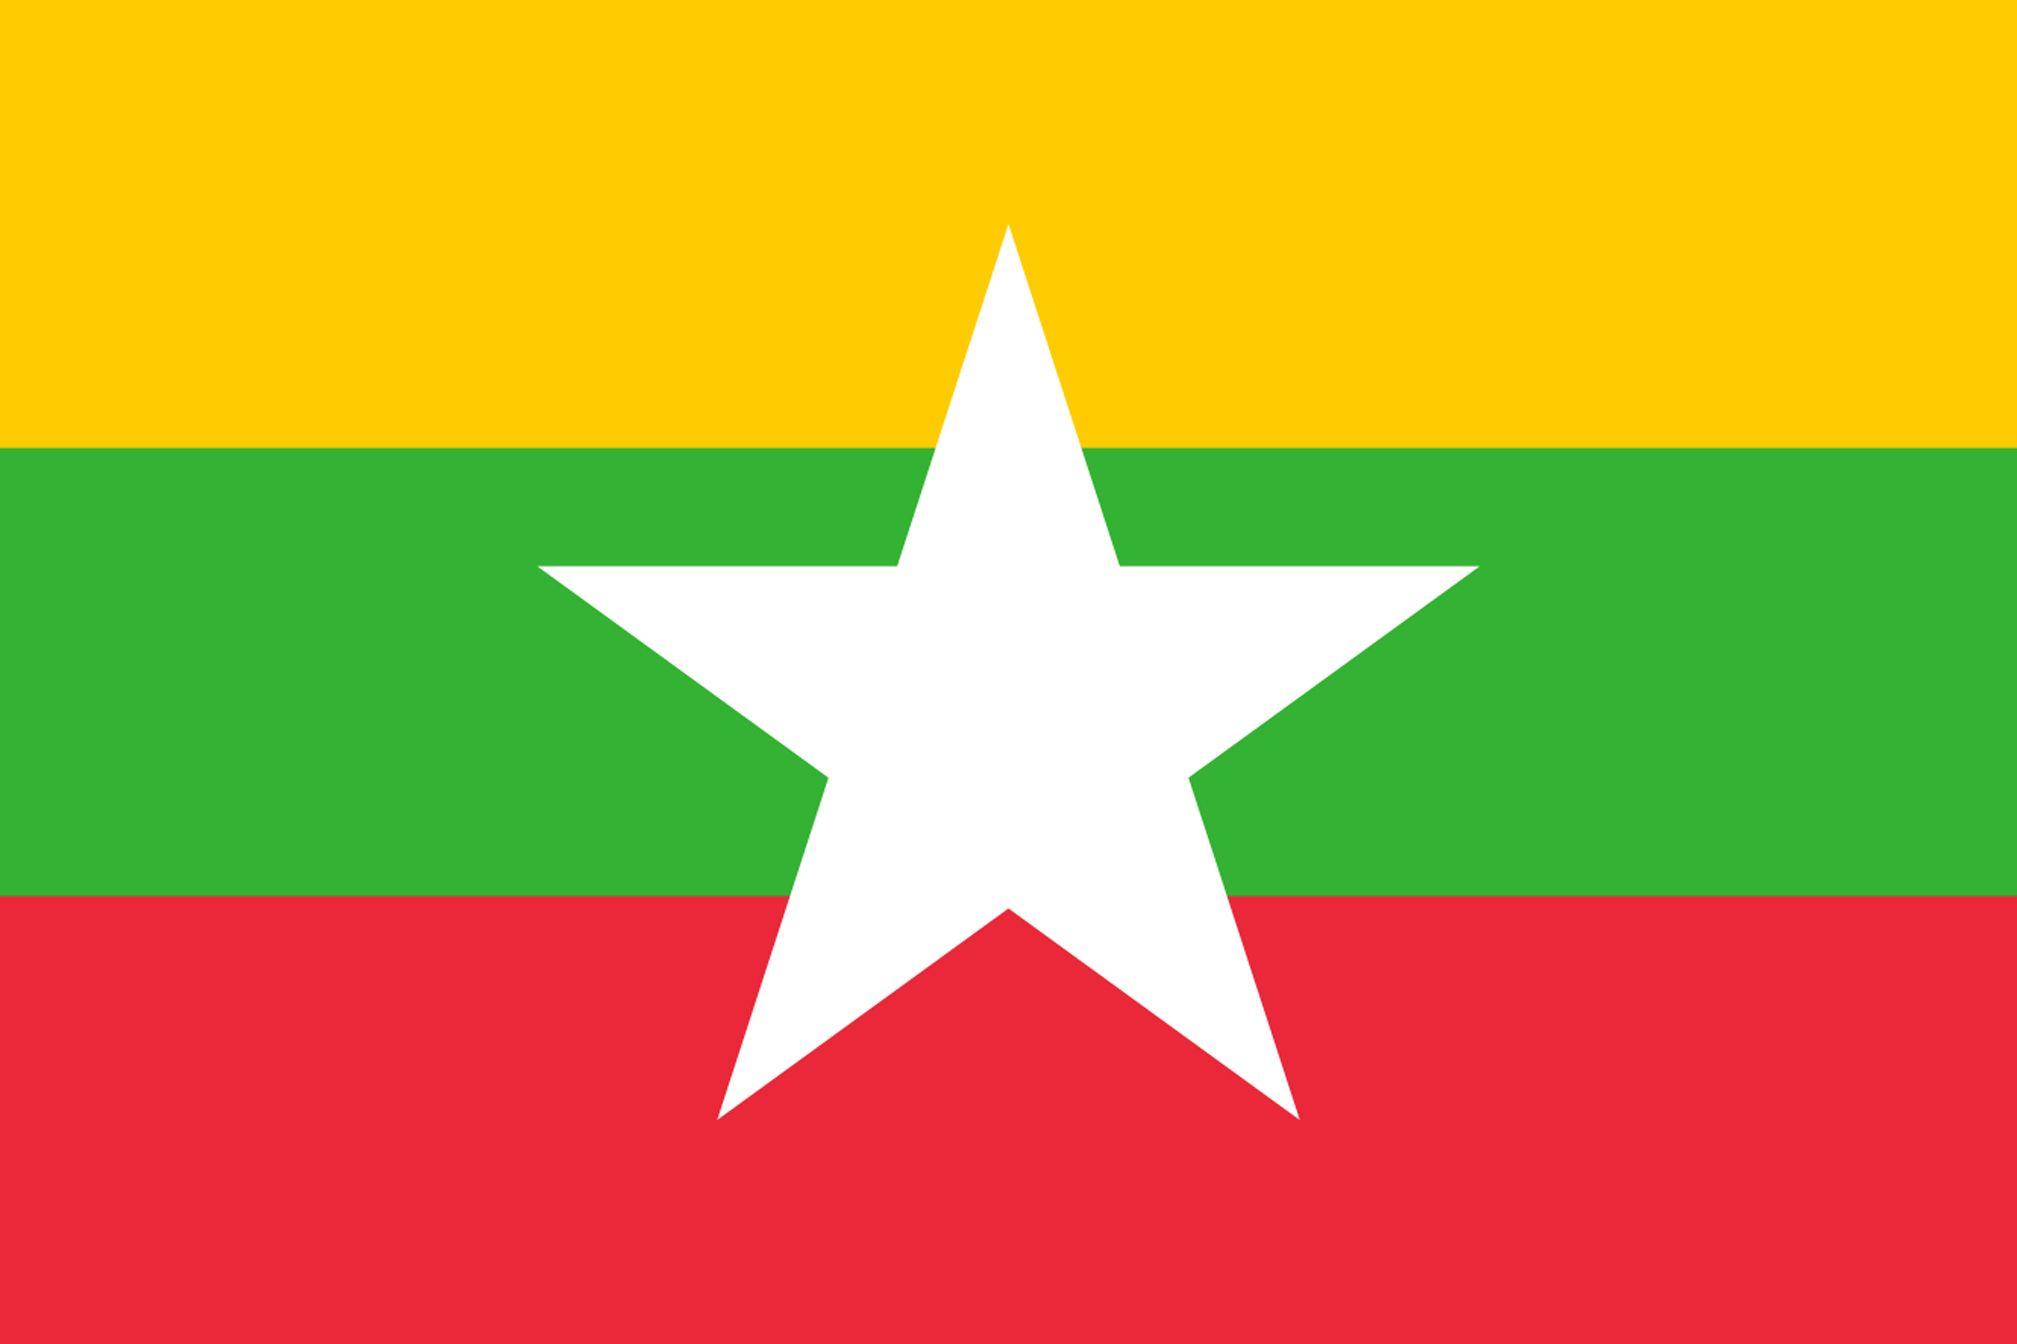 Republic Of The Union Of Myanmar สาธารณร ฐแห งสหภาพพม า Flags